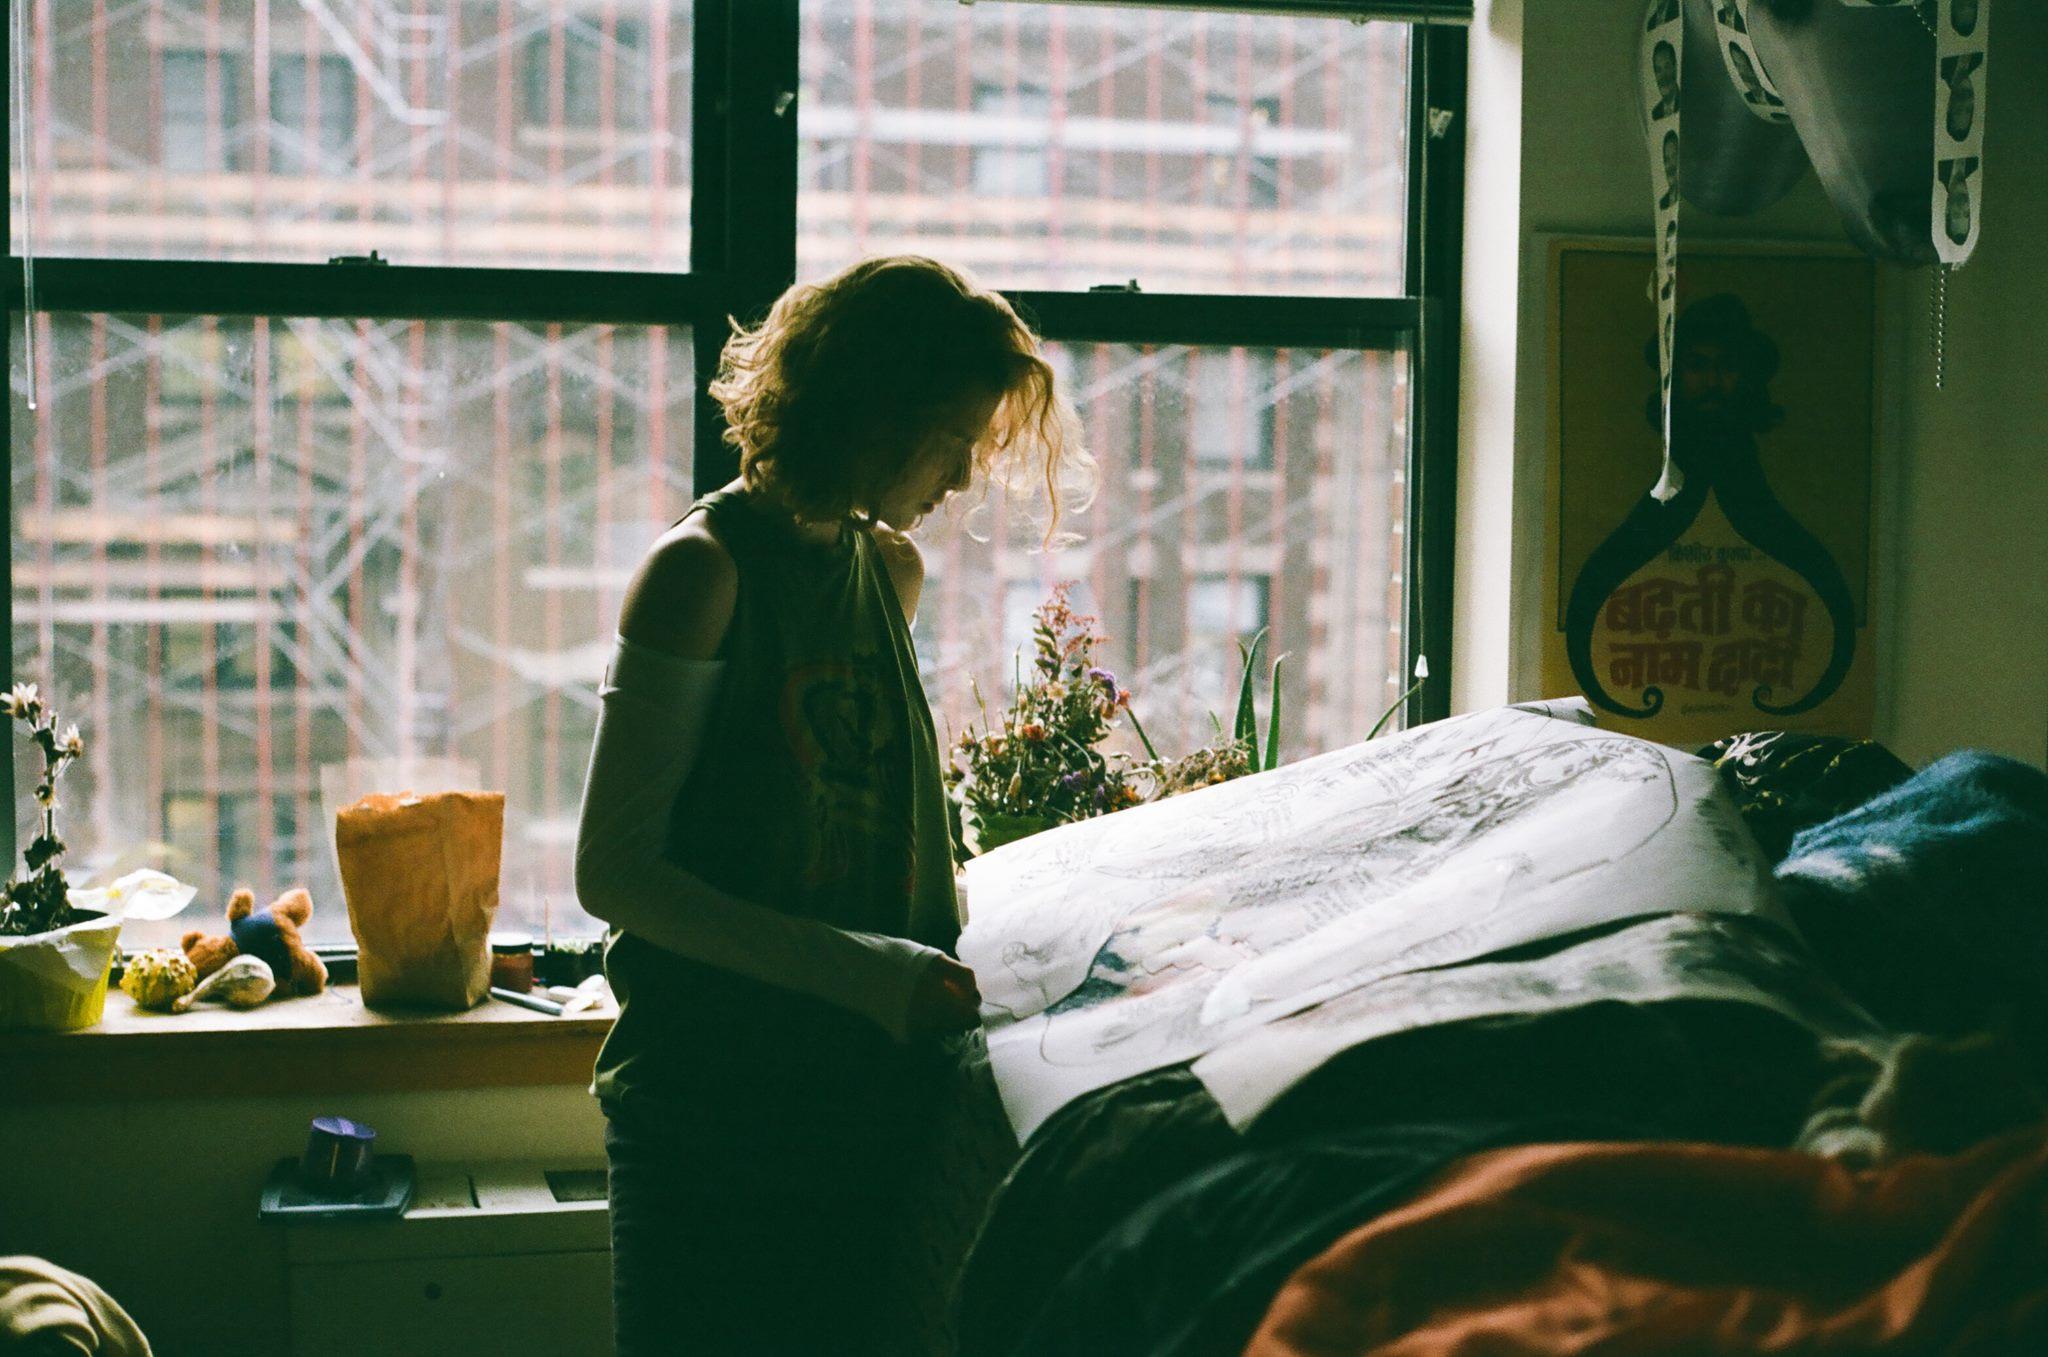 photography by Caroline Wallis